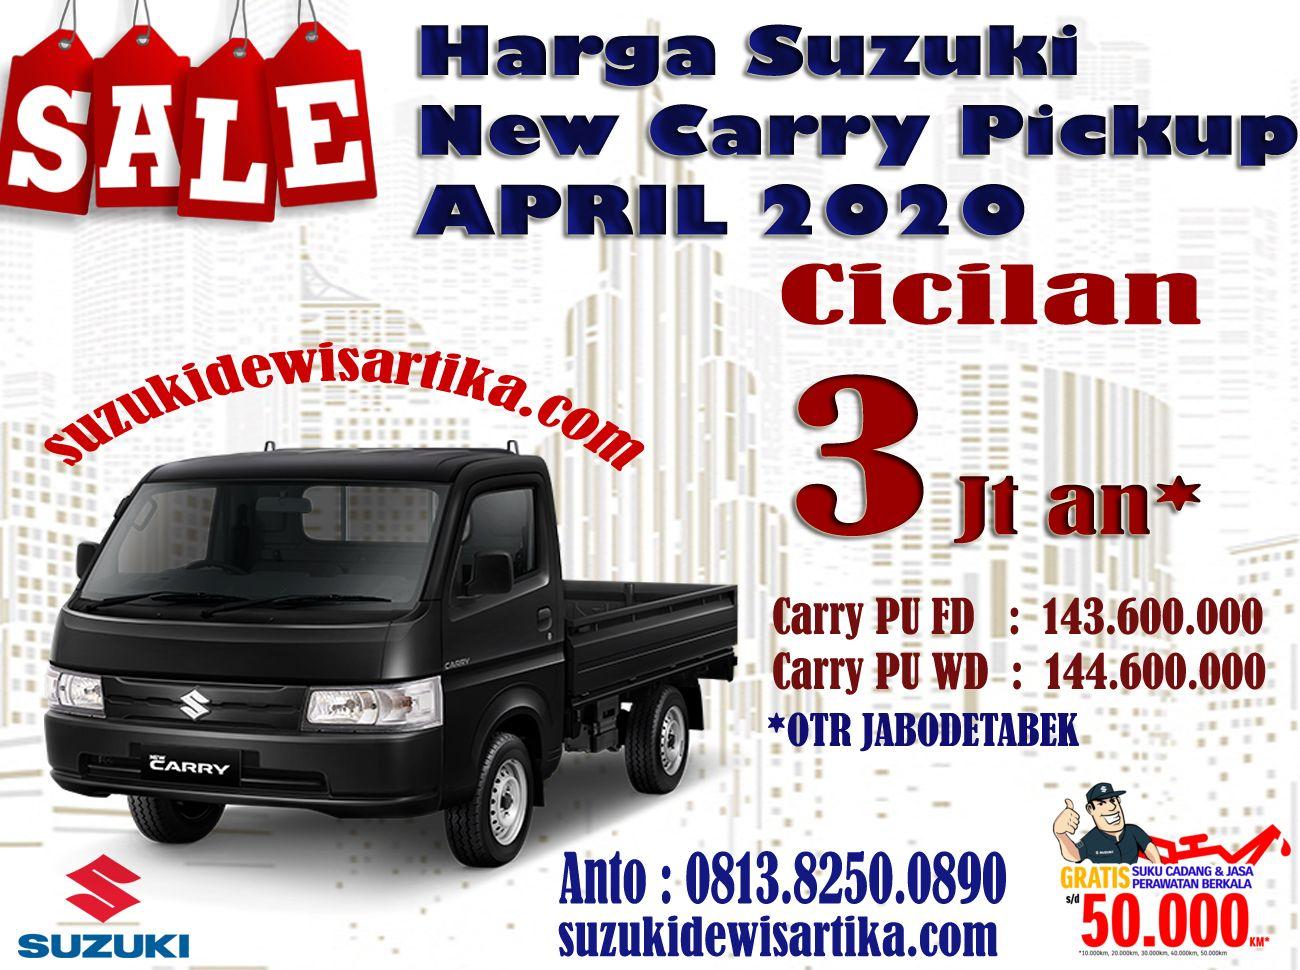 Harga Suzuki Carry Pickup Bulan April 2020 Perawatan Hubungan